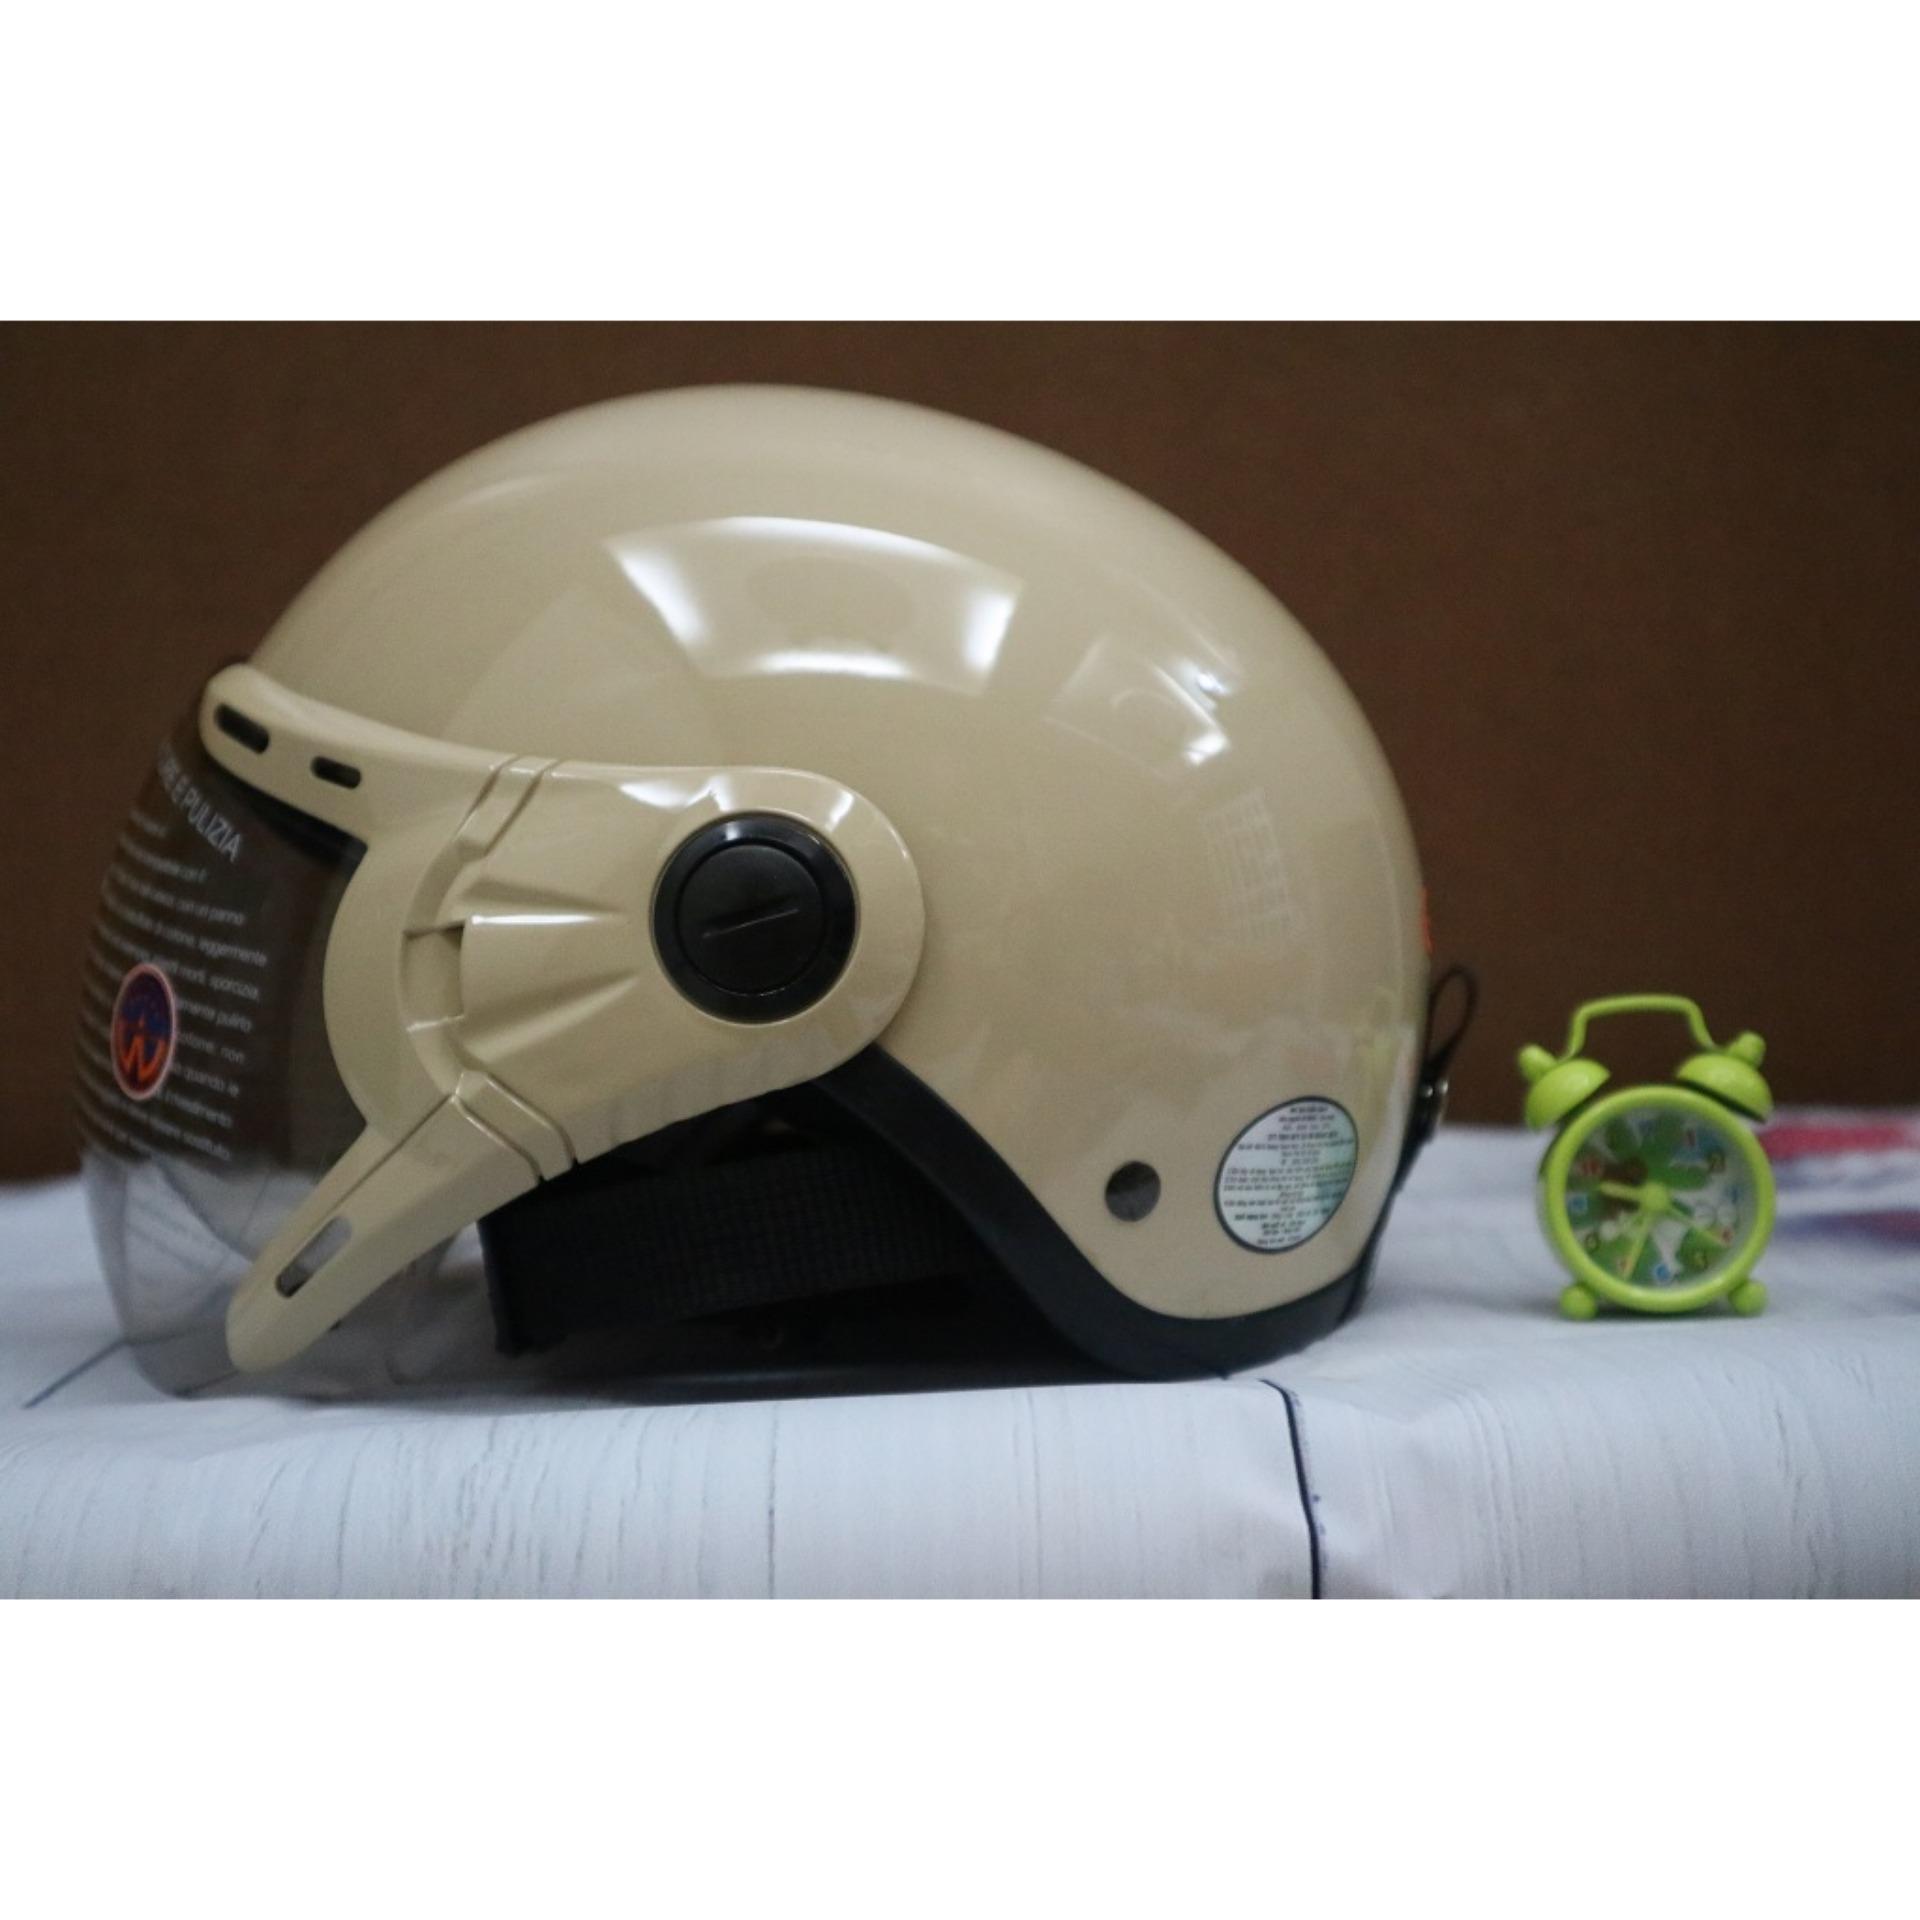 Mũ bảo hiểm GRS A33k (kem) Nhật Bản